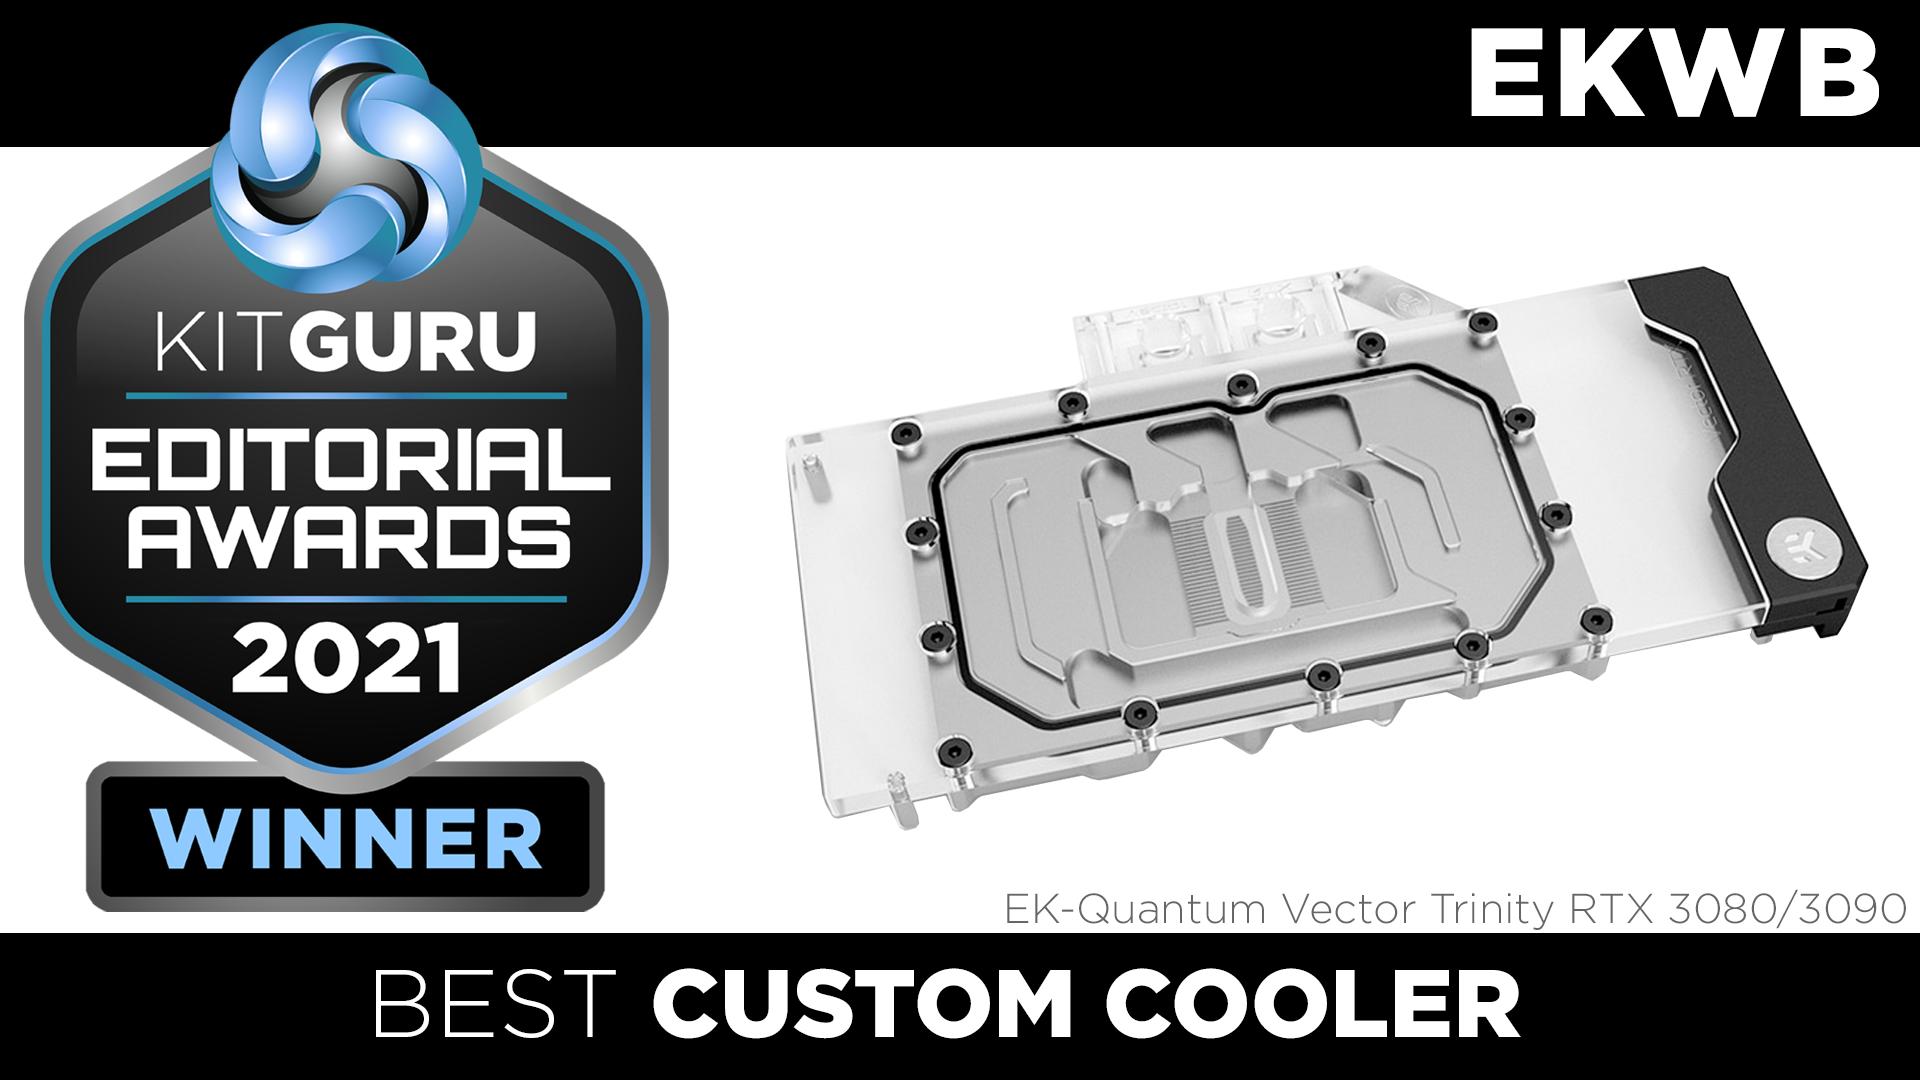 EK Quantum Vector Trinity RTX 3080 3090 water block wins Kitguru award